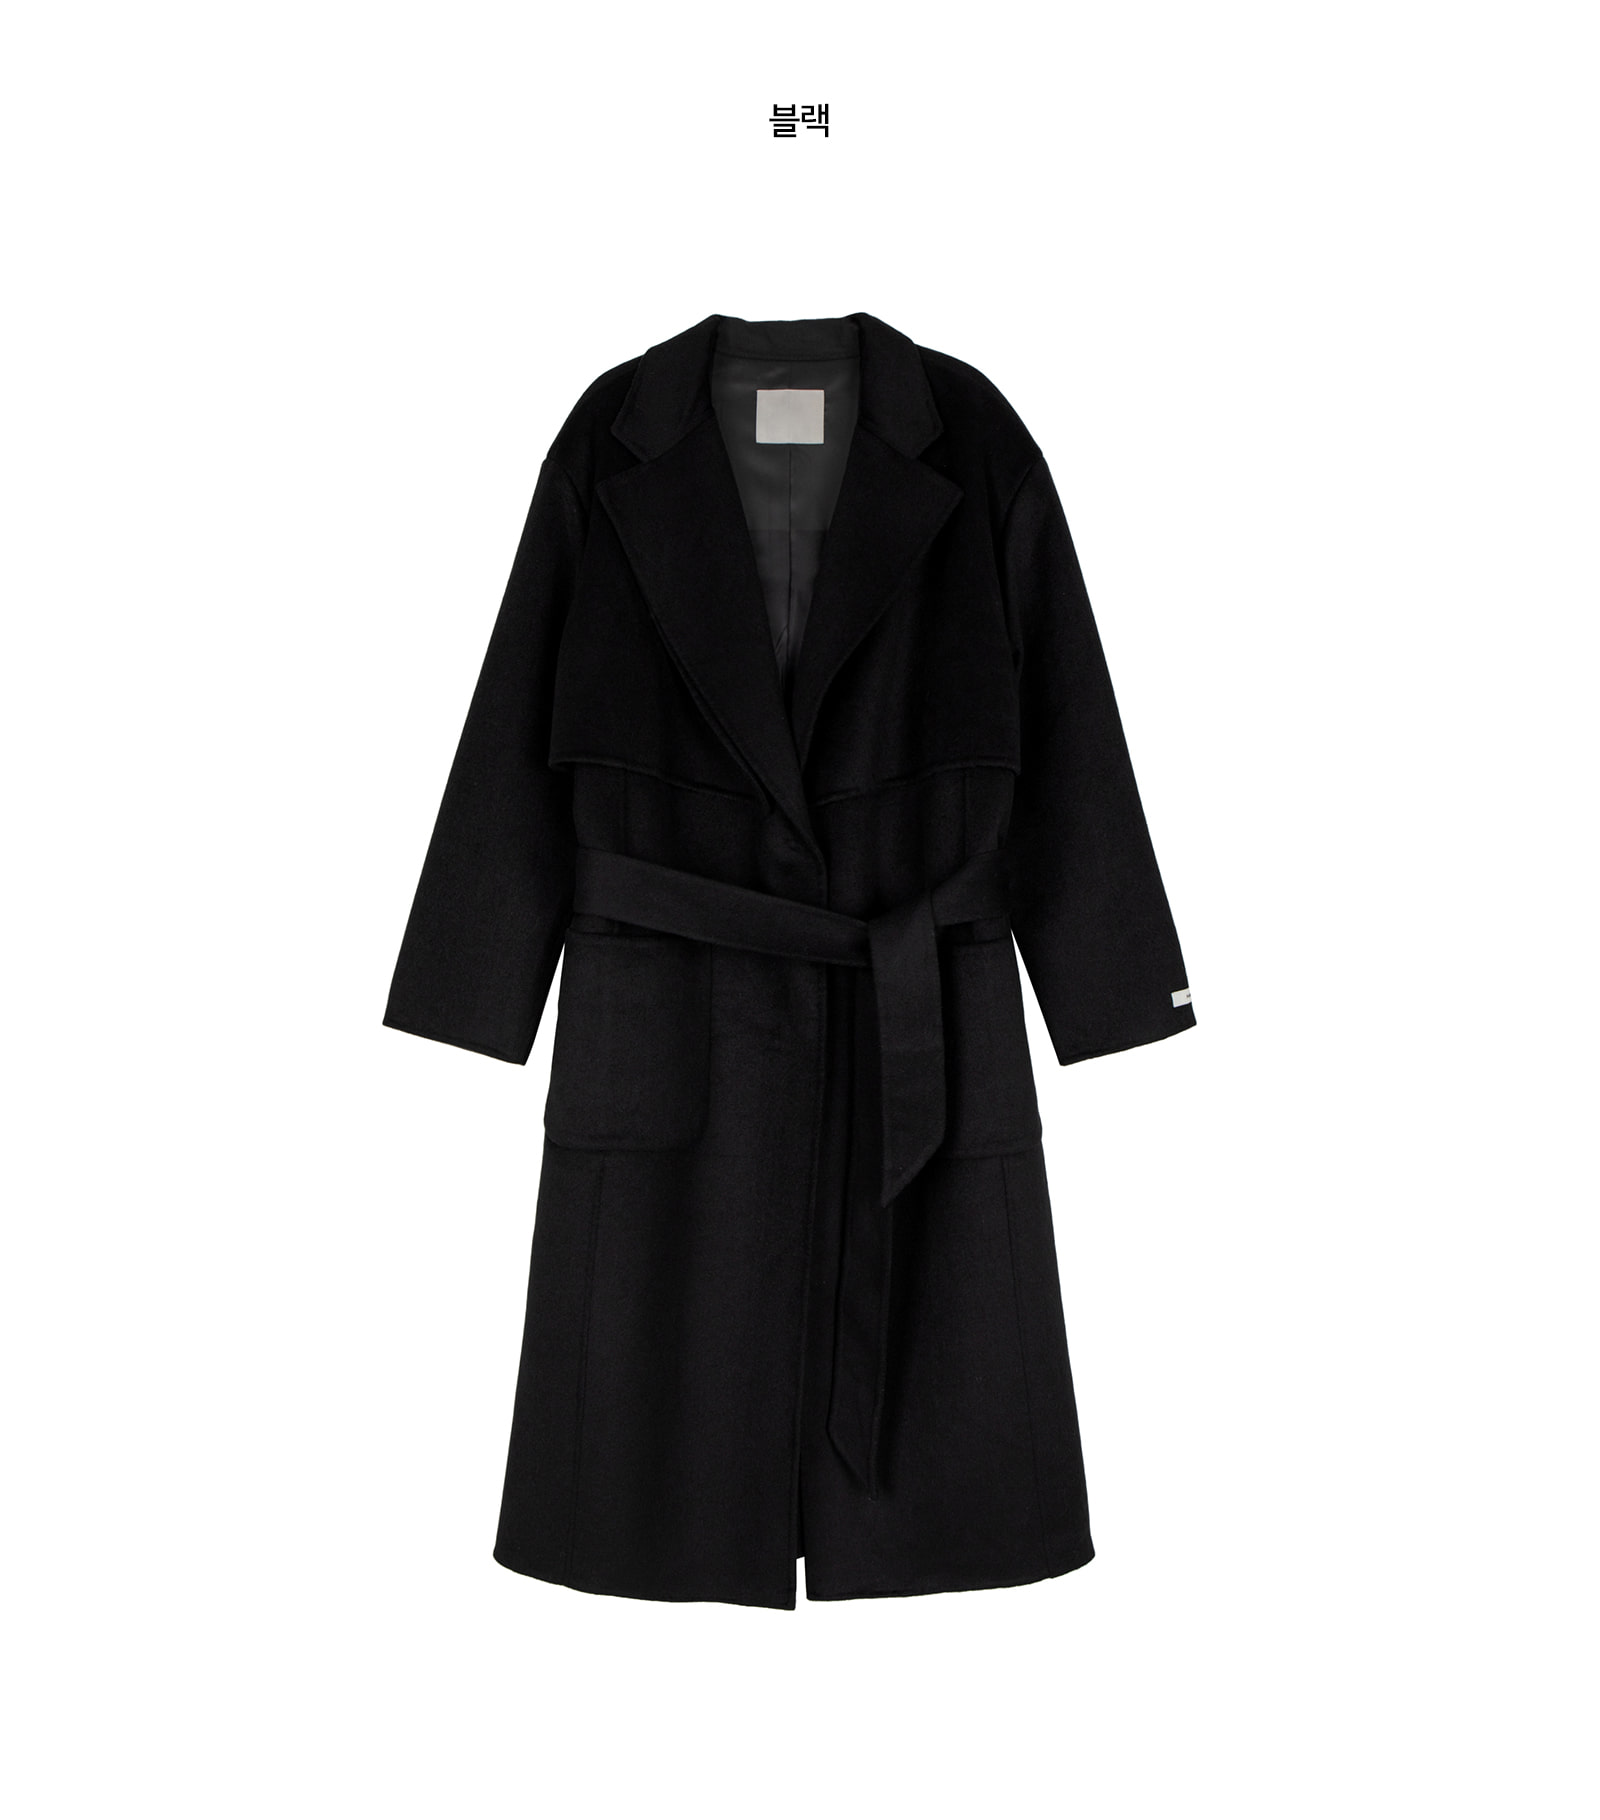 Planning Wool Double Collar Handmade Coat